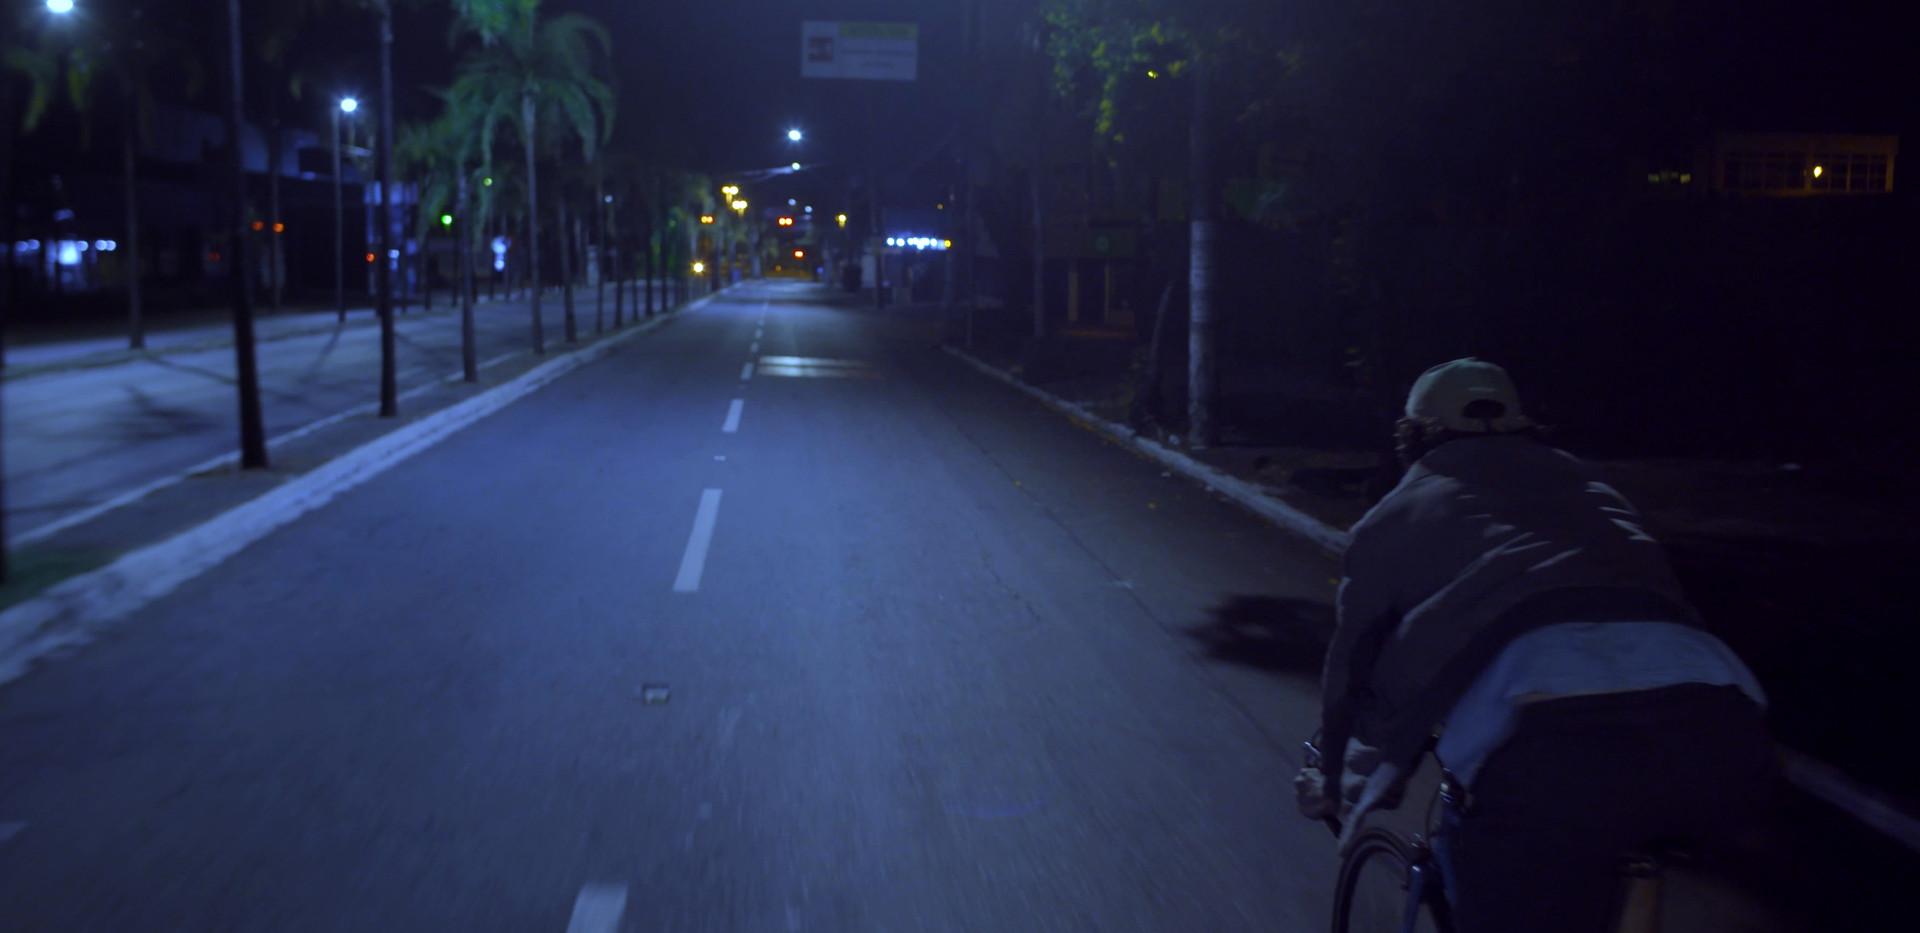 a_bicicleta.007133.jpg